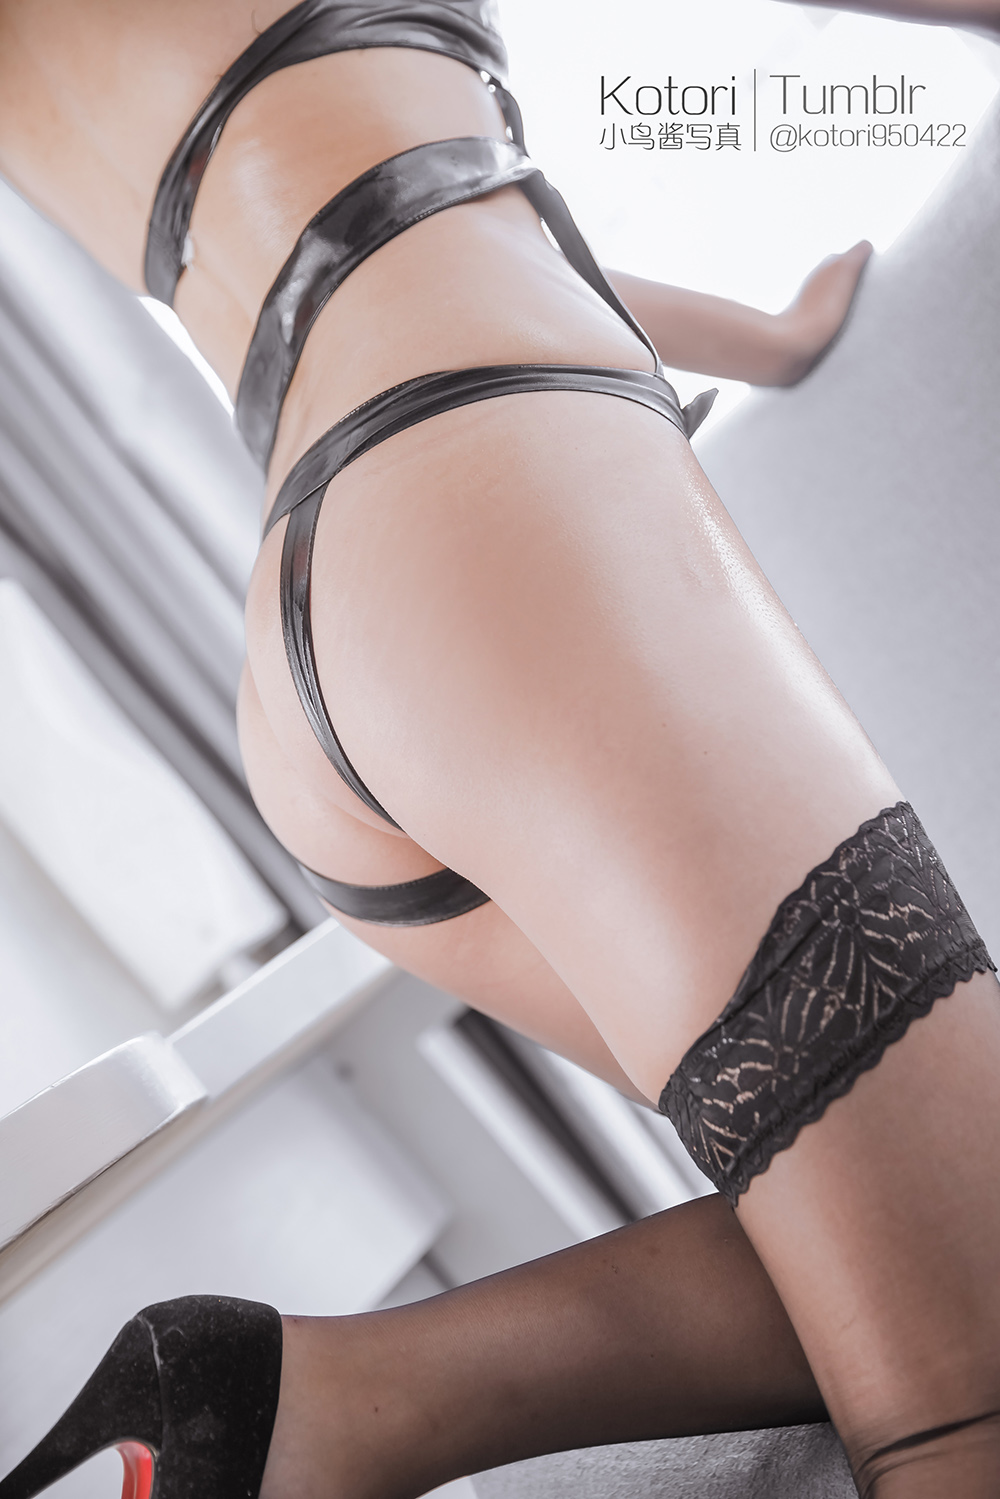 Duj1oz - Cosplay girl PR社 福利姬 小鸟酱系列–黑色束缚衣